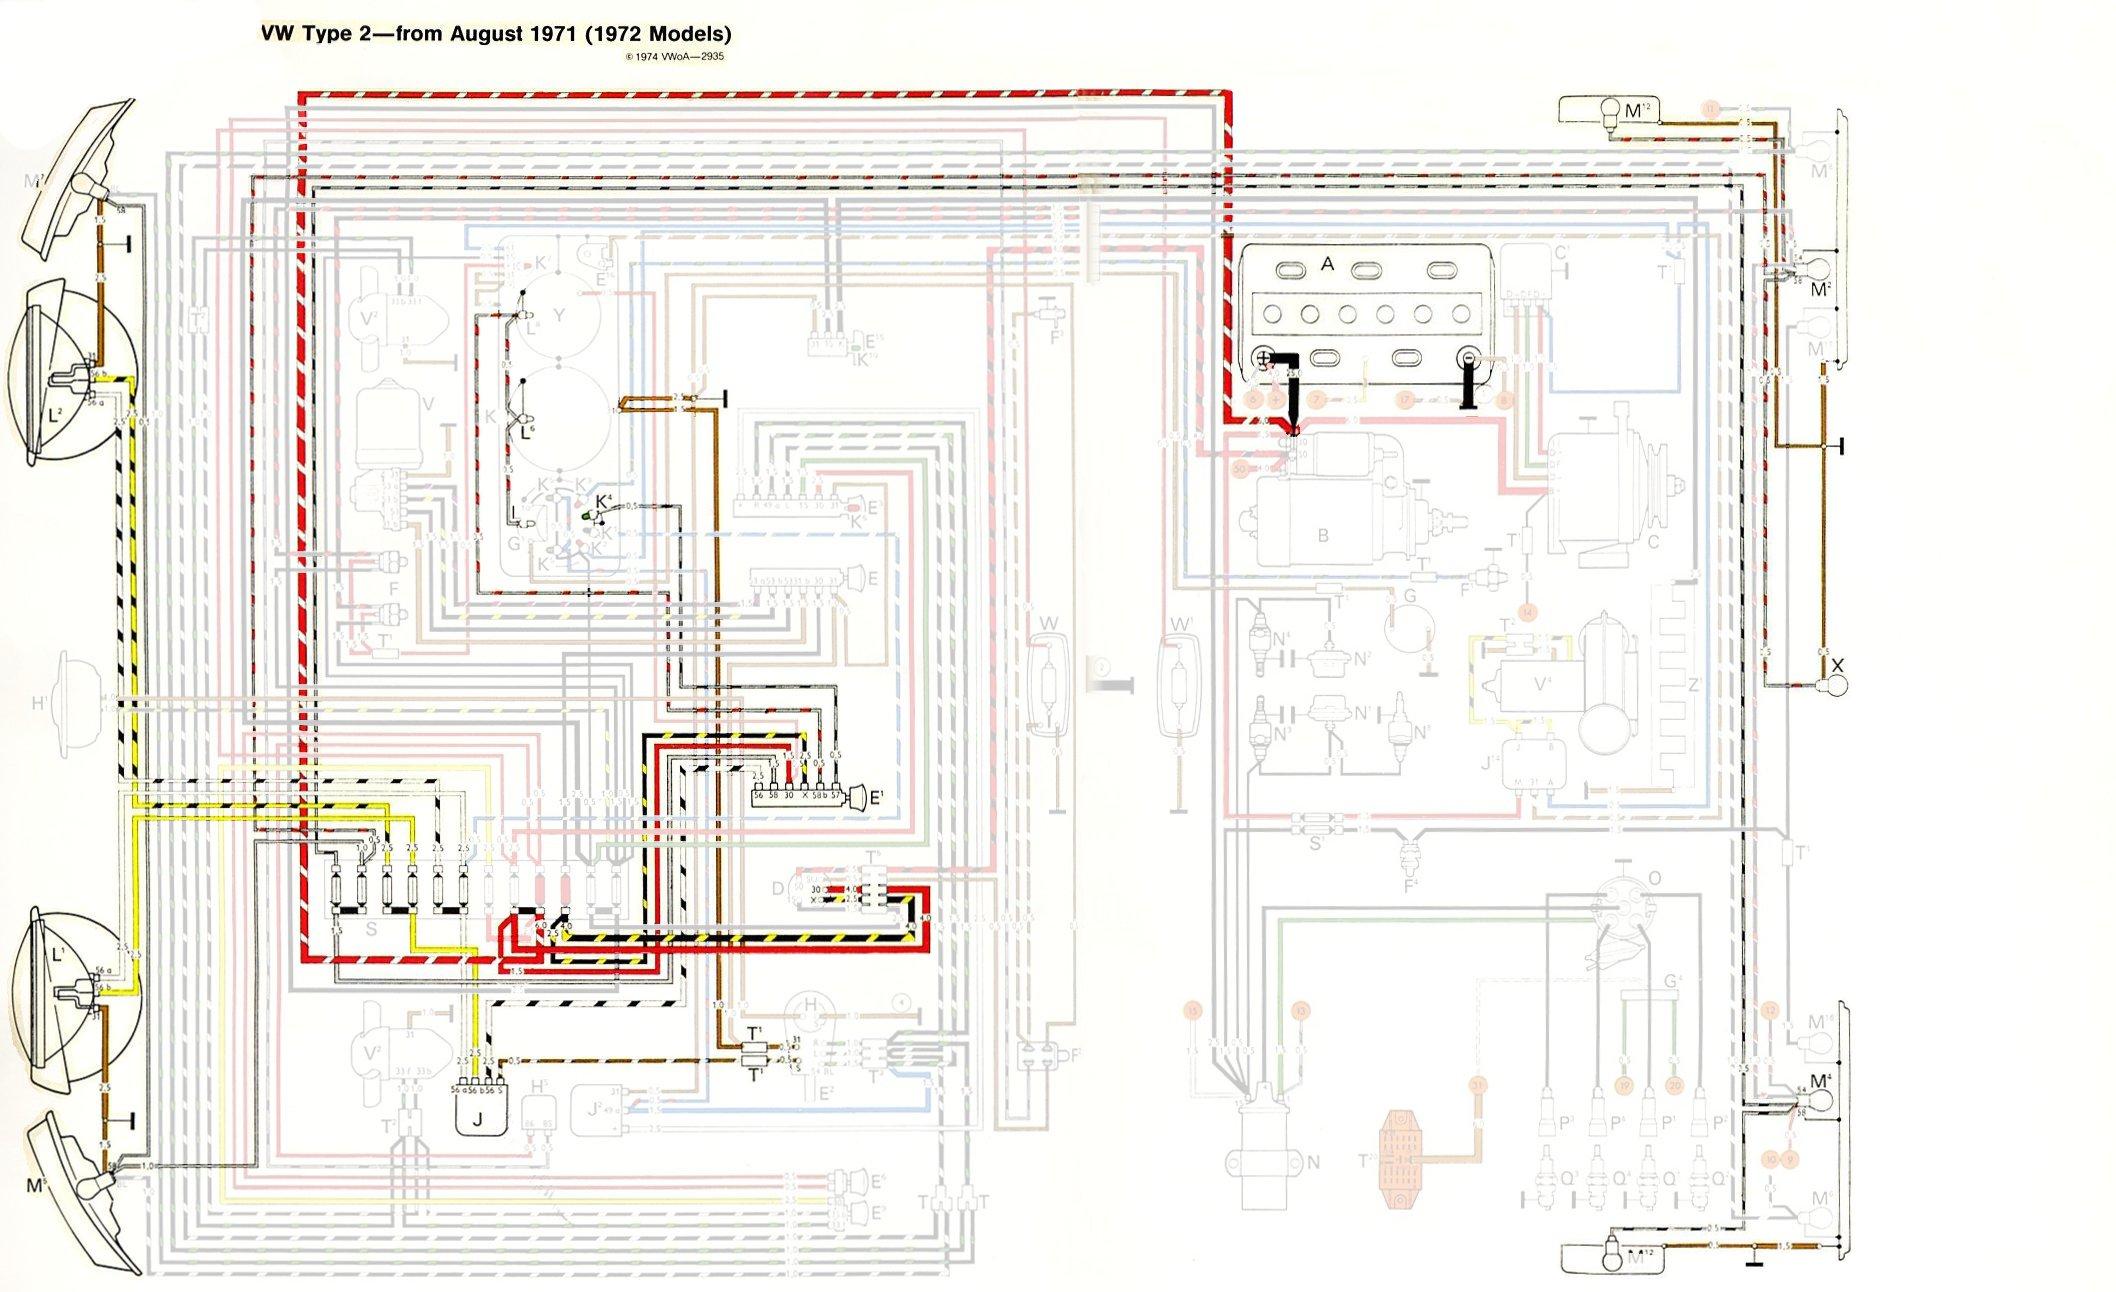 thesamba com type 2 wiring diagrams volvo fuse diagram volvo fuse diagram volvo fuse diagram volvo fuse diagram